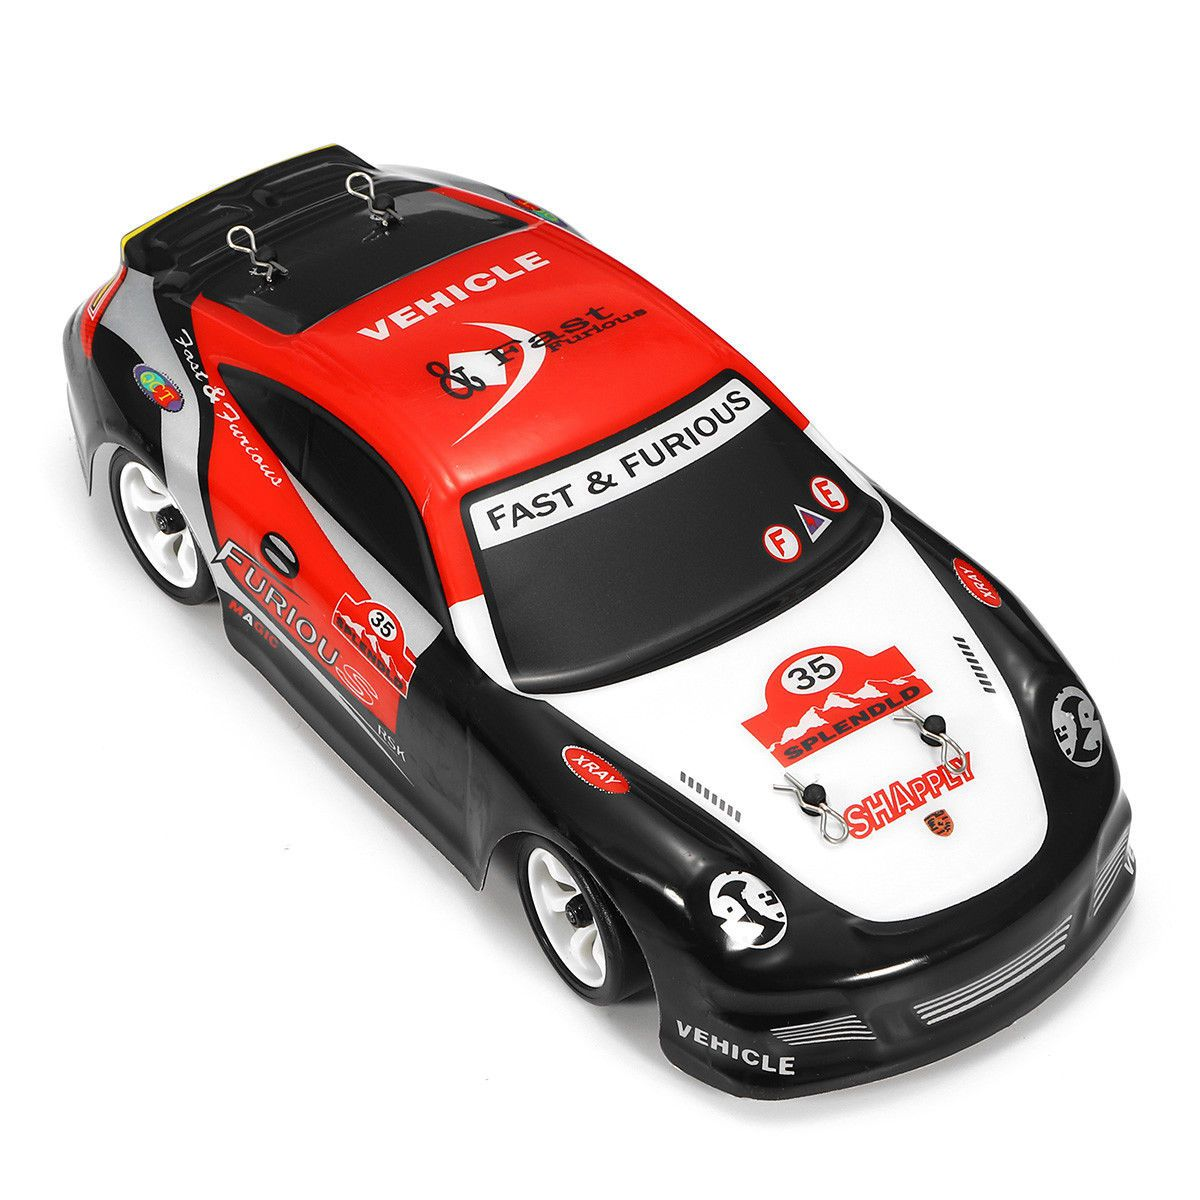 K969 1/28 2,4G 4WD cepillado RC coche de alta velocidad Drift coche de juguete para niños, enchufe de la UE 2,4G/5G 4K WiFi inalámbrico reflejo Cable HDMI Cable adaptador 1080P Dongle para IPhone Samsung Xiaomi Huawei teléfono Android TV